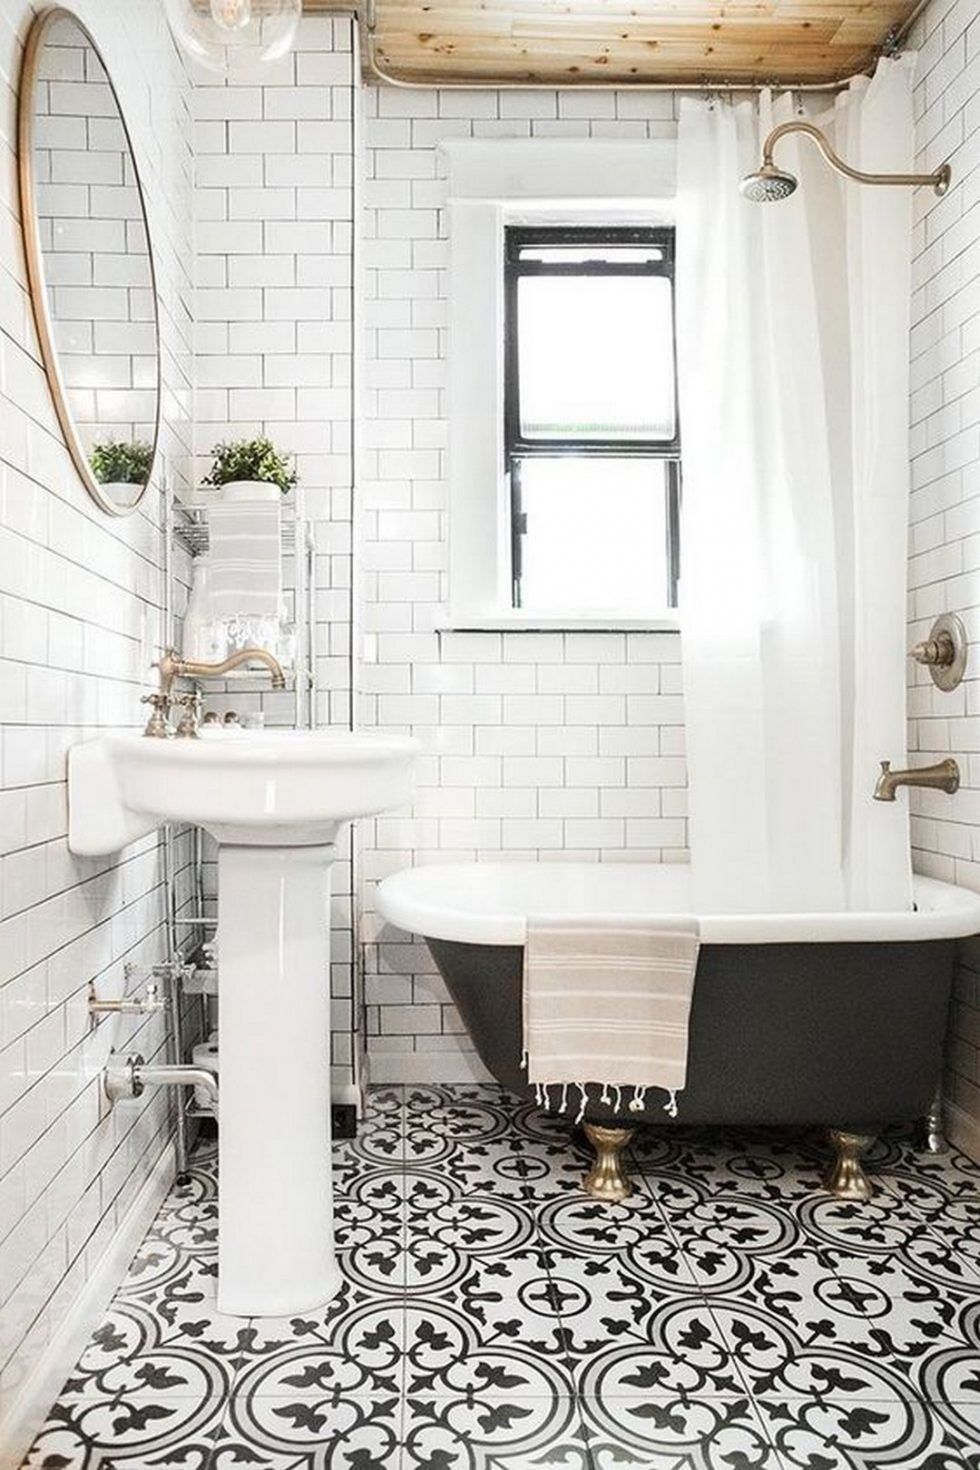 Spanish Bathrooms Ideas Spanish Bathrooms Small Design By Beckmann House Beckm Bathrooms B In 2020 Bathroom Design Small Bathroom Interior Design Bathroom Design